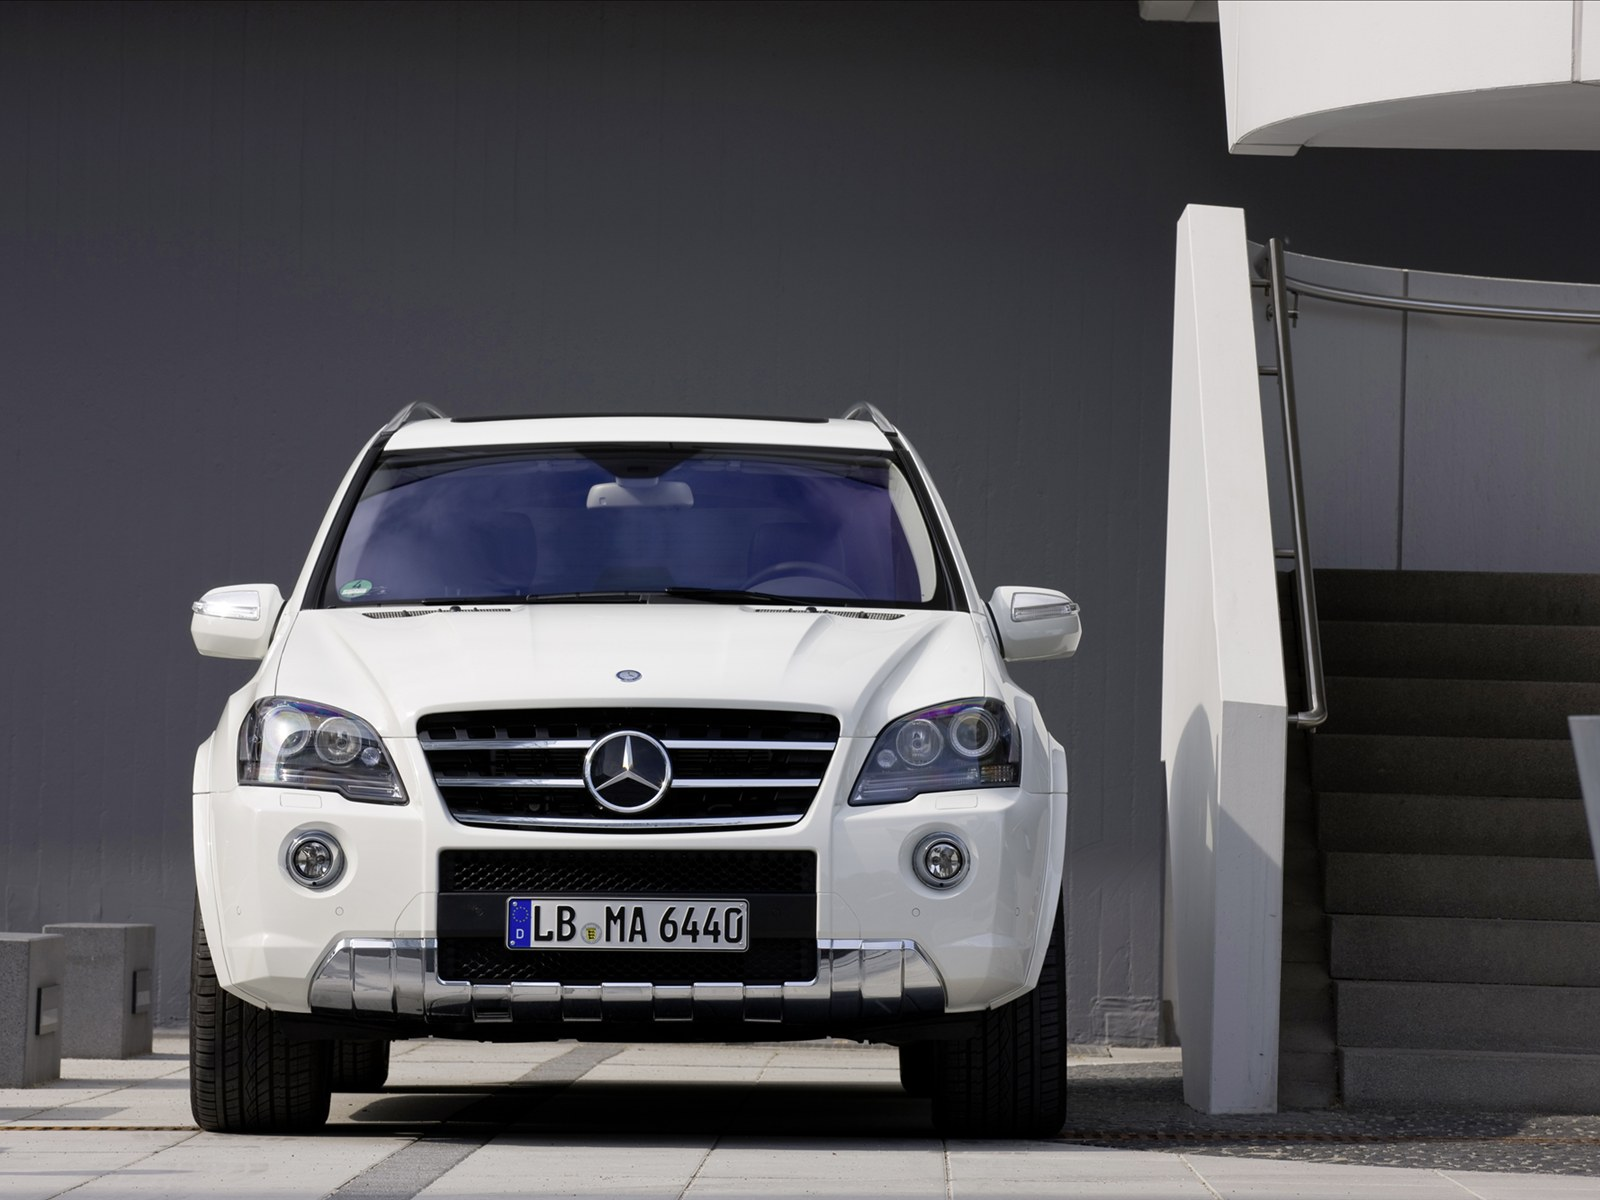 http://1.bp.blogspot.com/_J3_liDBfbvs/TCSqQS0p7gI/AAAAAAAAuqQ/X1W-QOWVH-4/s1600/2011-Mercedes-Benz-ML-63-AMG-Front-View.jpg